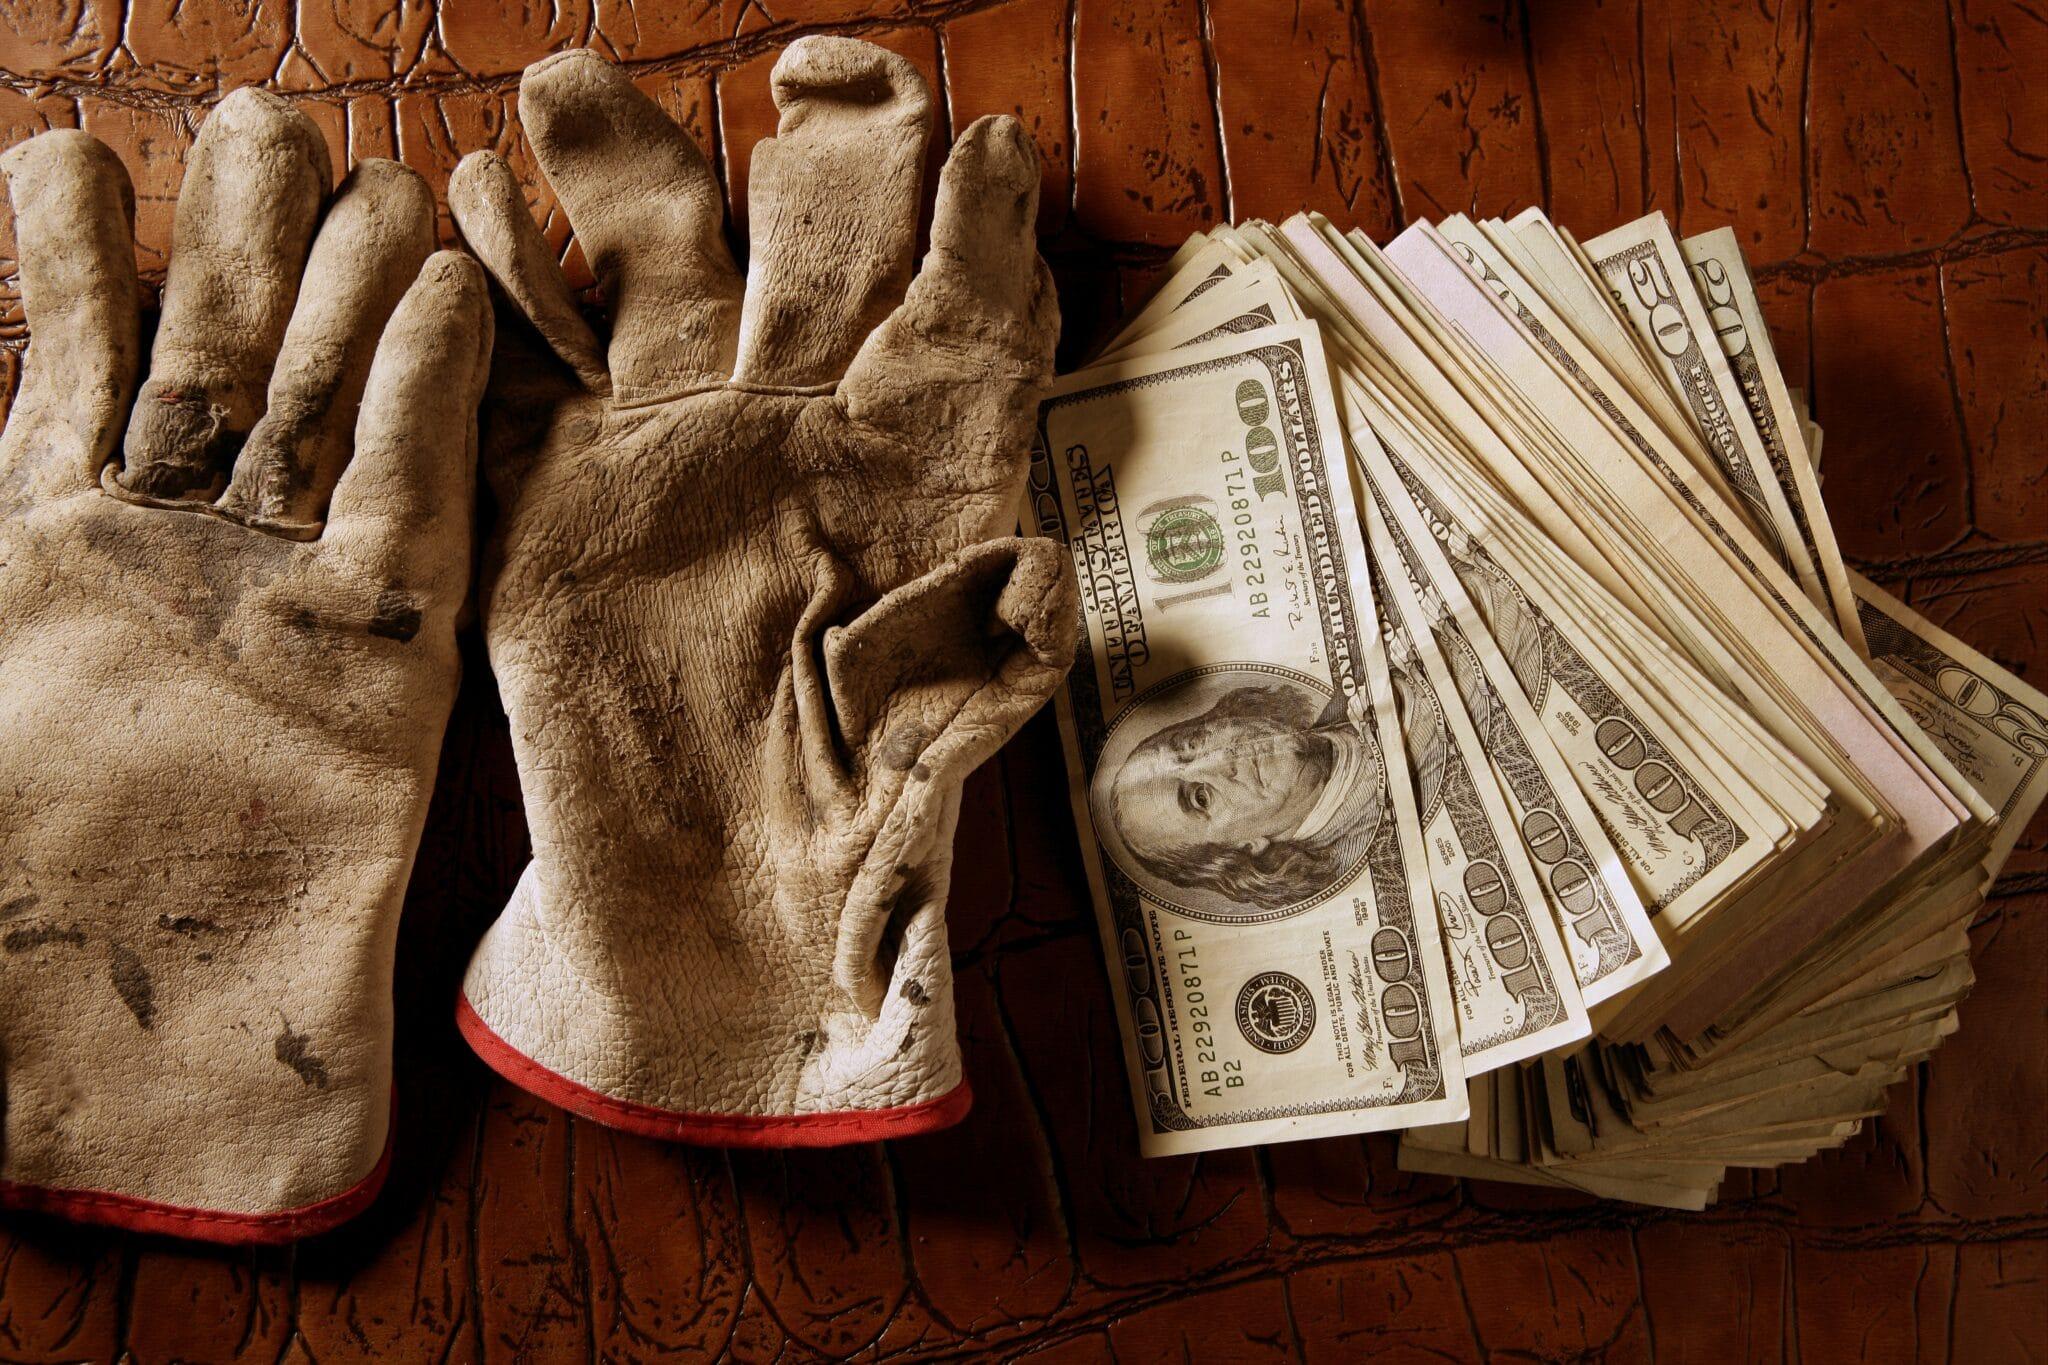 dirty work gloves next to stack of 100 dollar bills